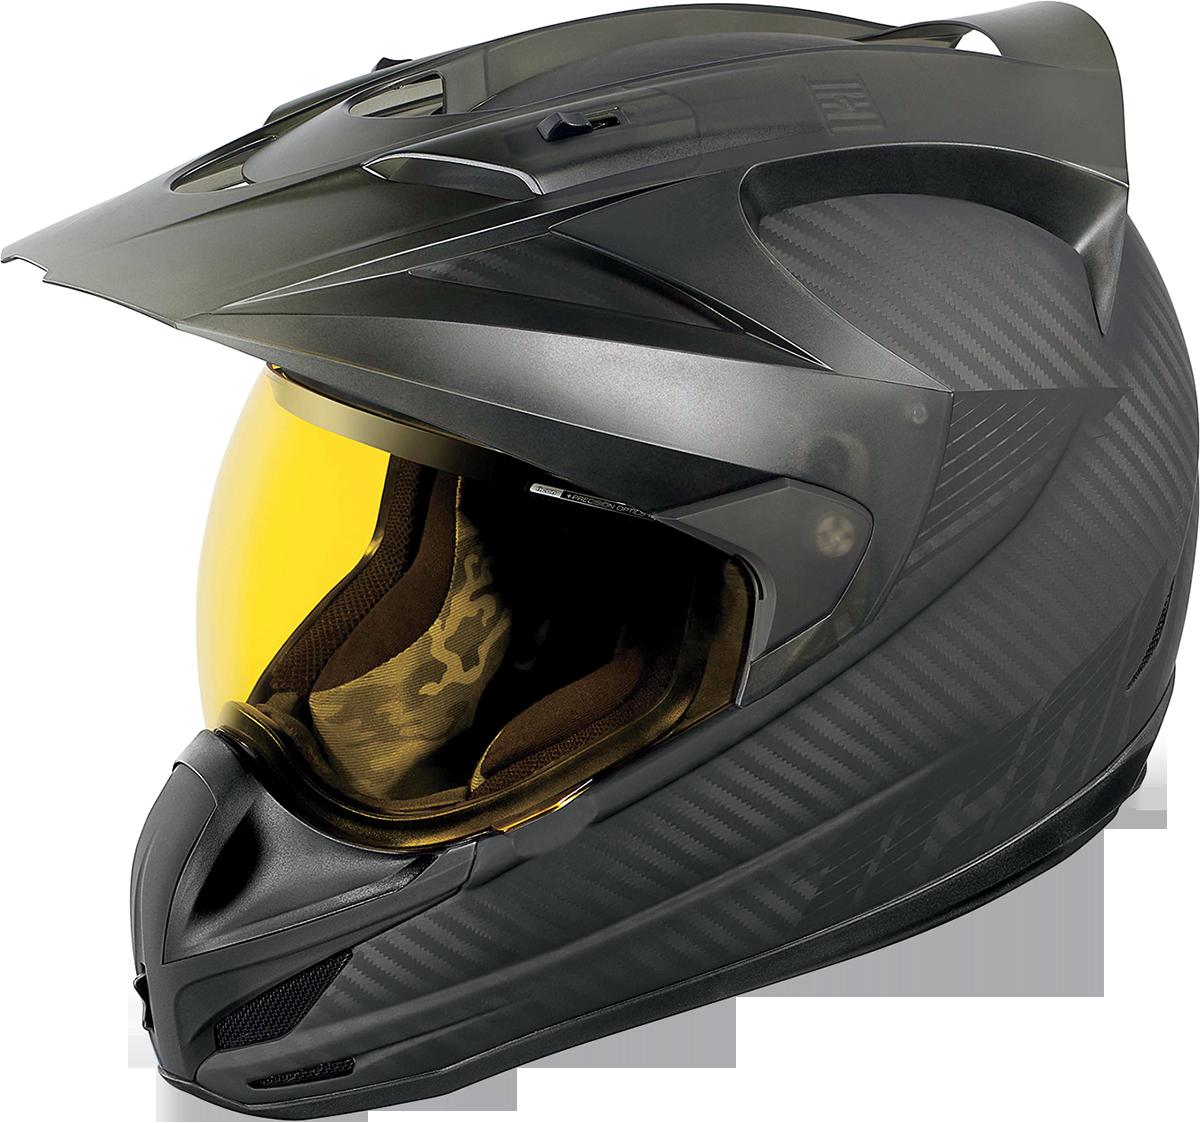 Carbon Fiber Motorcycle Helmet >> Icon Variant Ghost Carbon Full Face Motorcycle Helmet